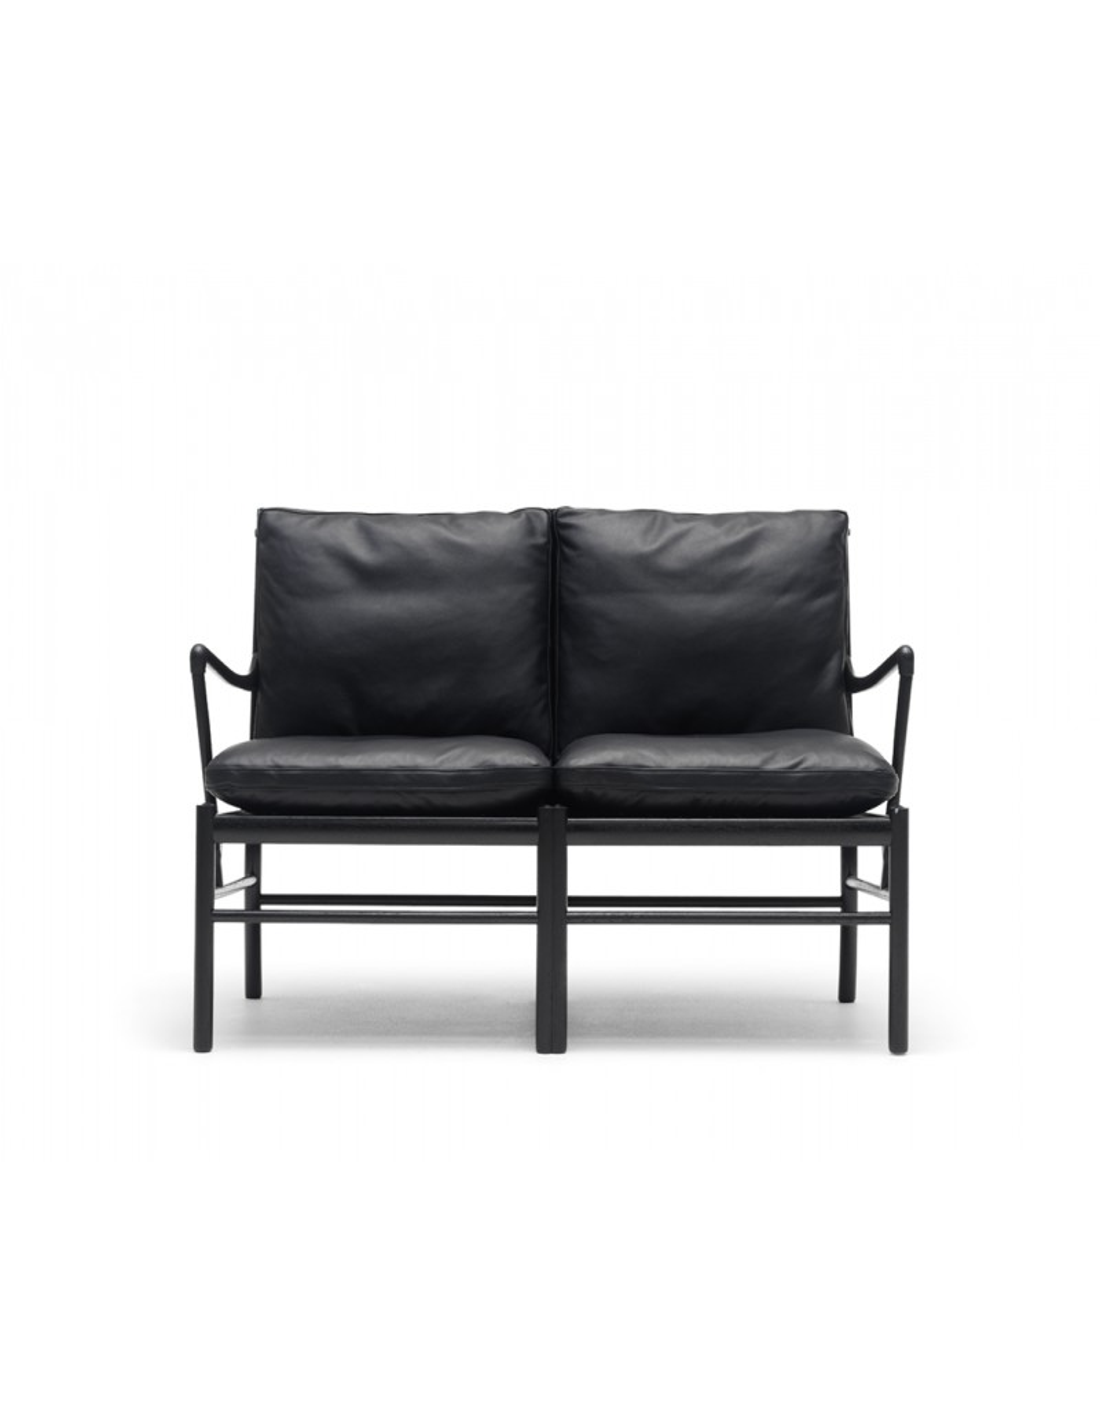 colonial sofa design ole wanscher for carl hansen scandinavian design. Black Bedroom Furniture Sets. Home Design Ideas